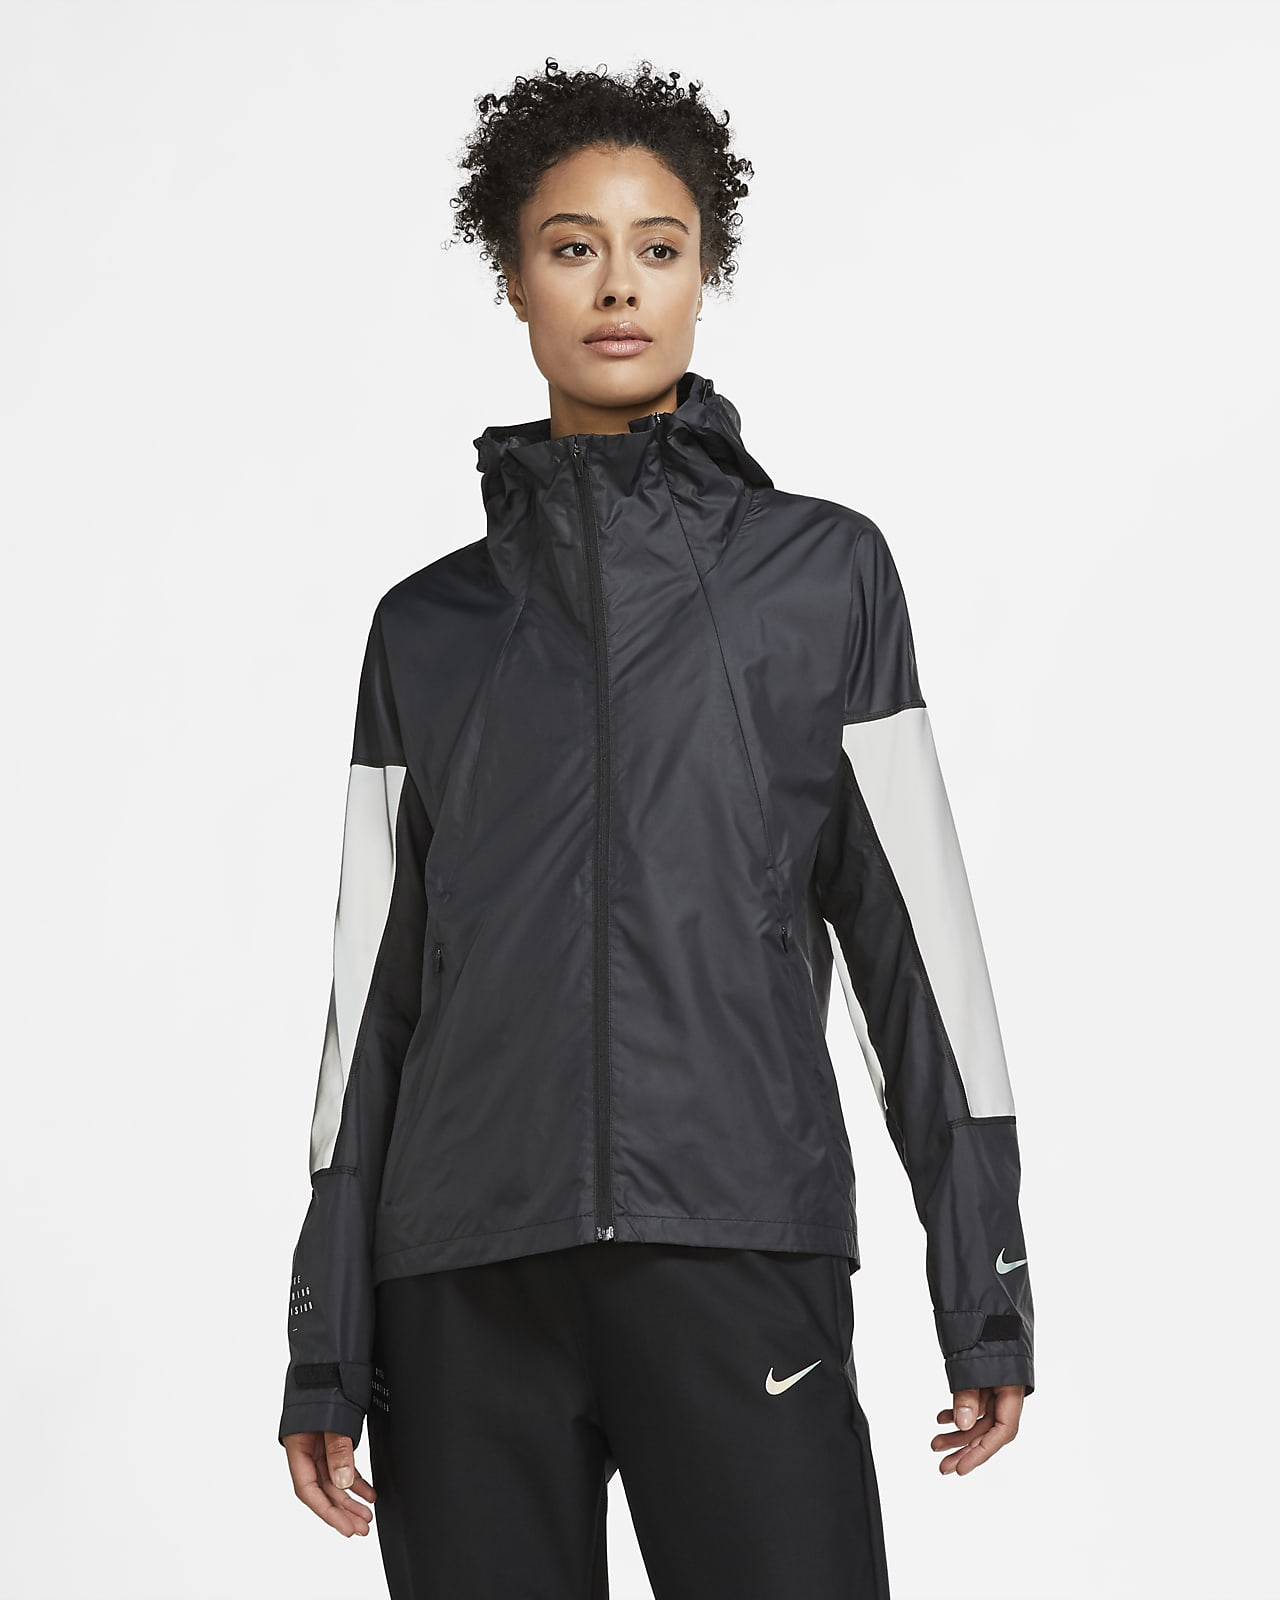 Nike Run Division Flash Women's Running Jacket